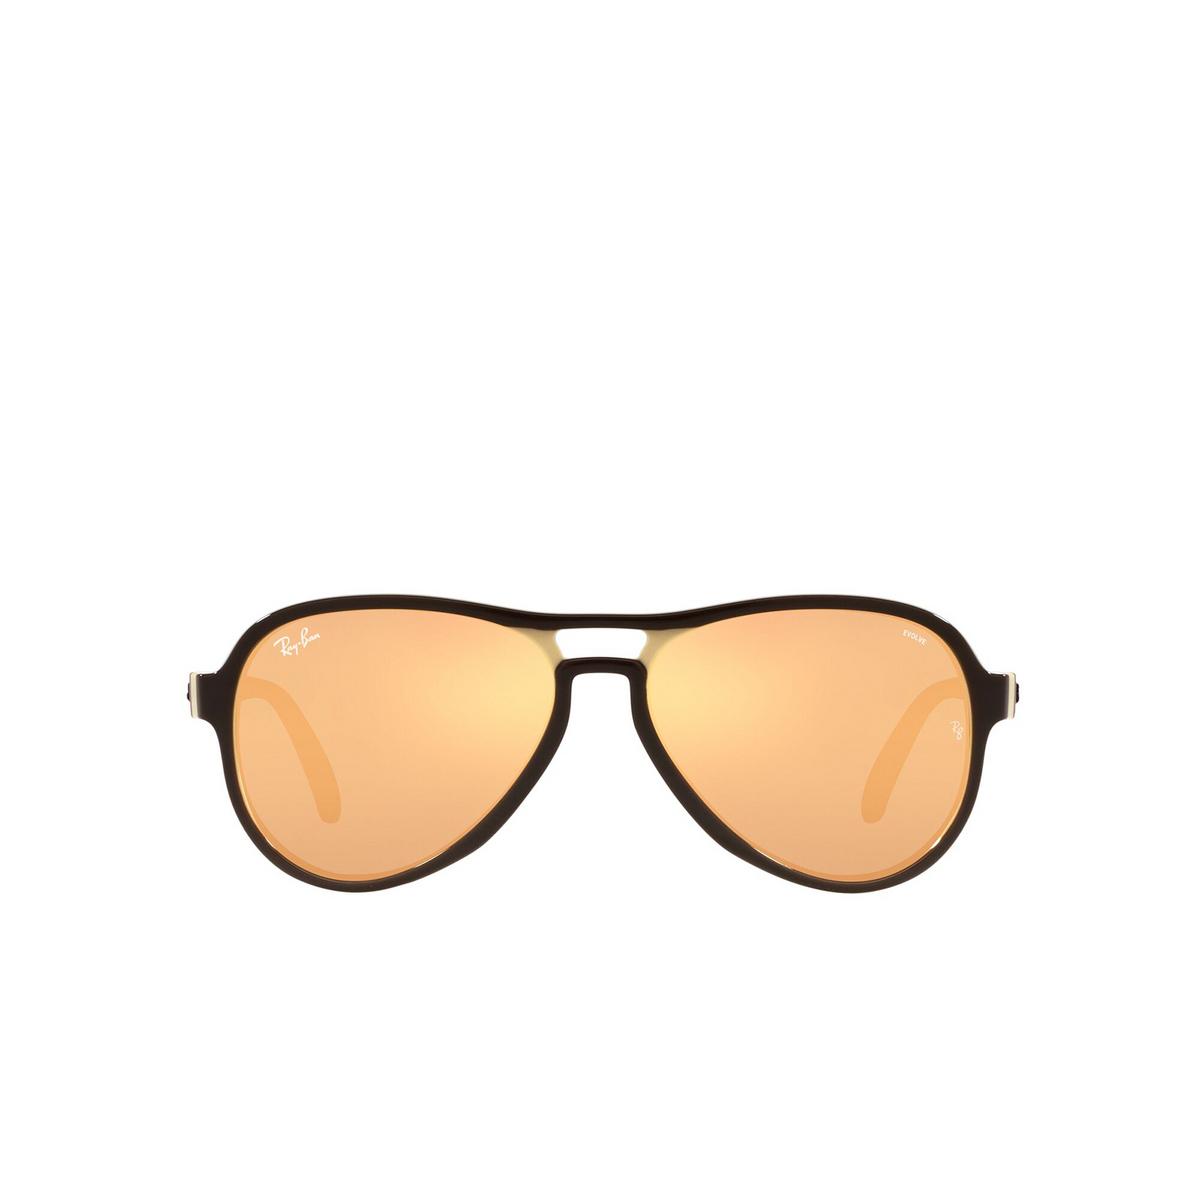 Ray-Ban® Aviator Sunglasses: Vagabond RB4355 color Dark Brown Light Brown 6547B4 - front view.